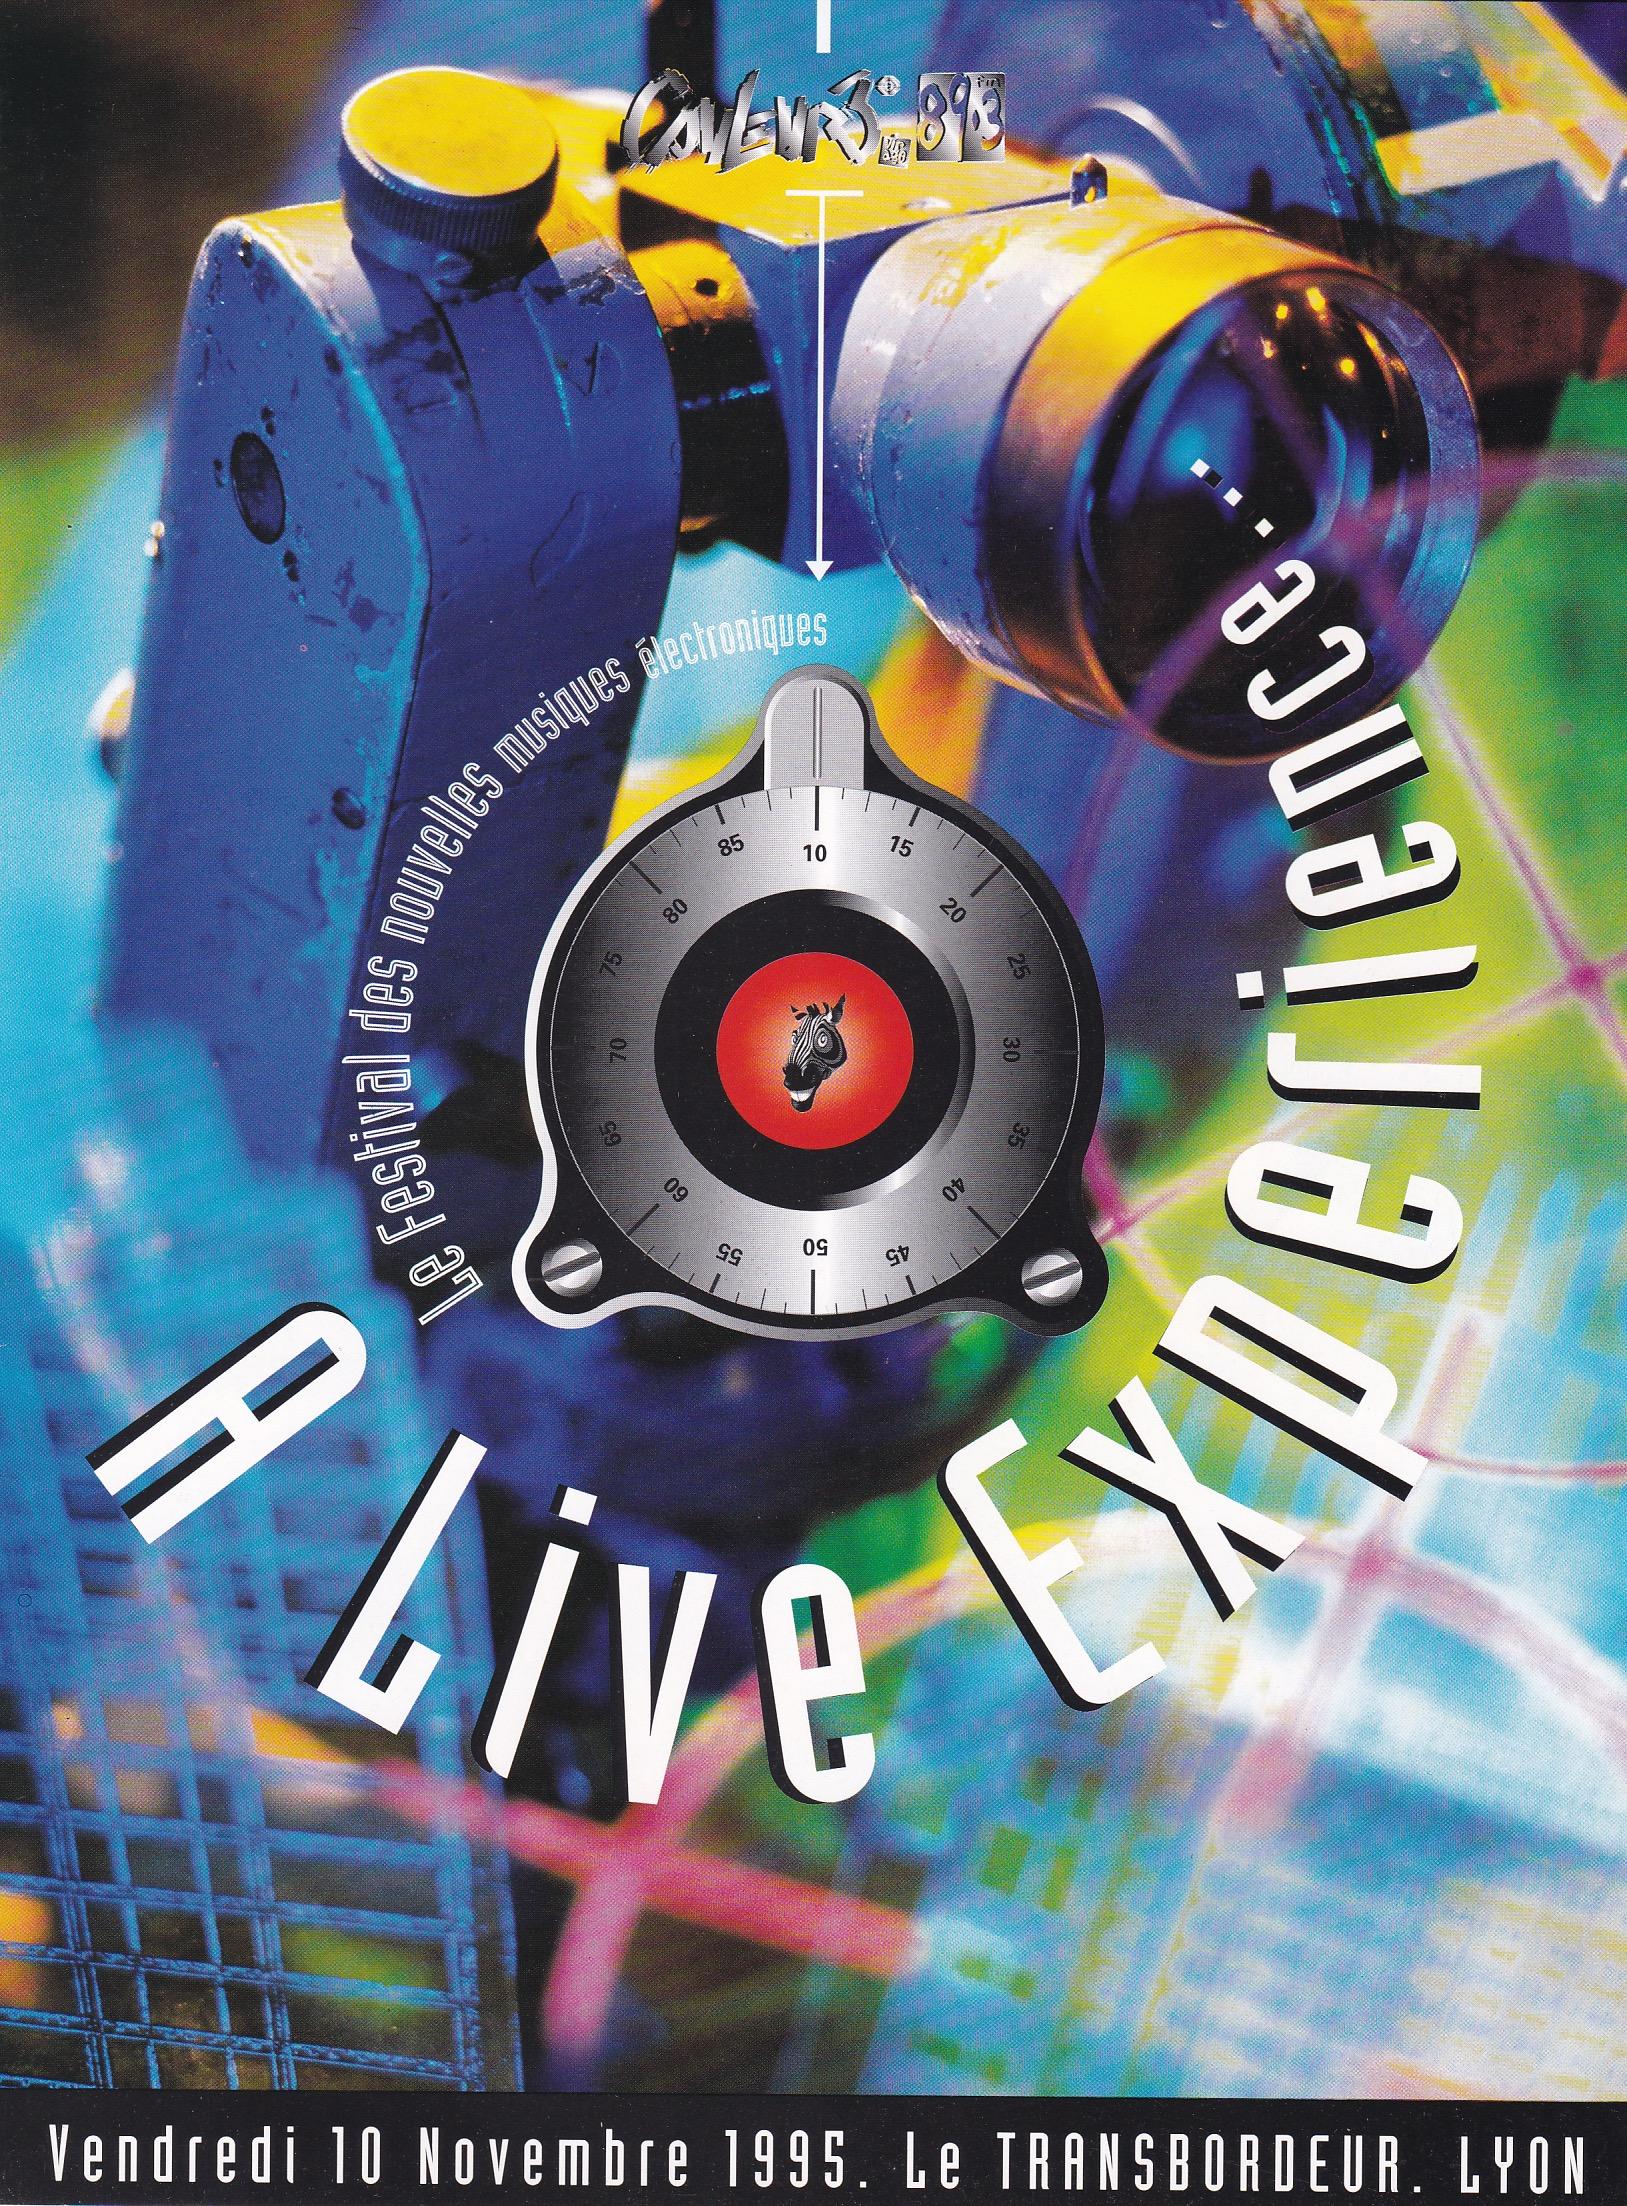 Live Experience au Transbordeur Lyon 10/11/95